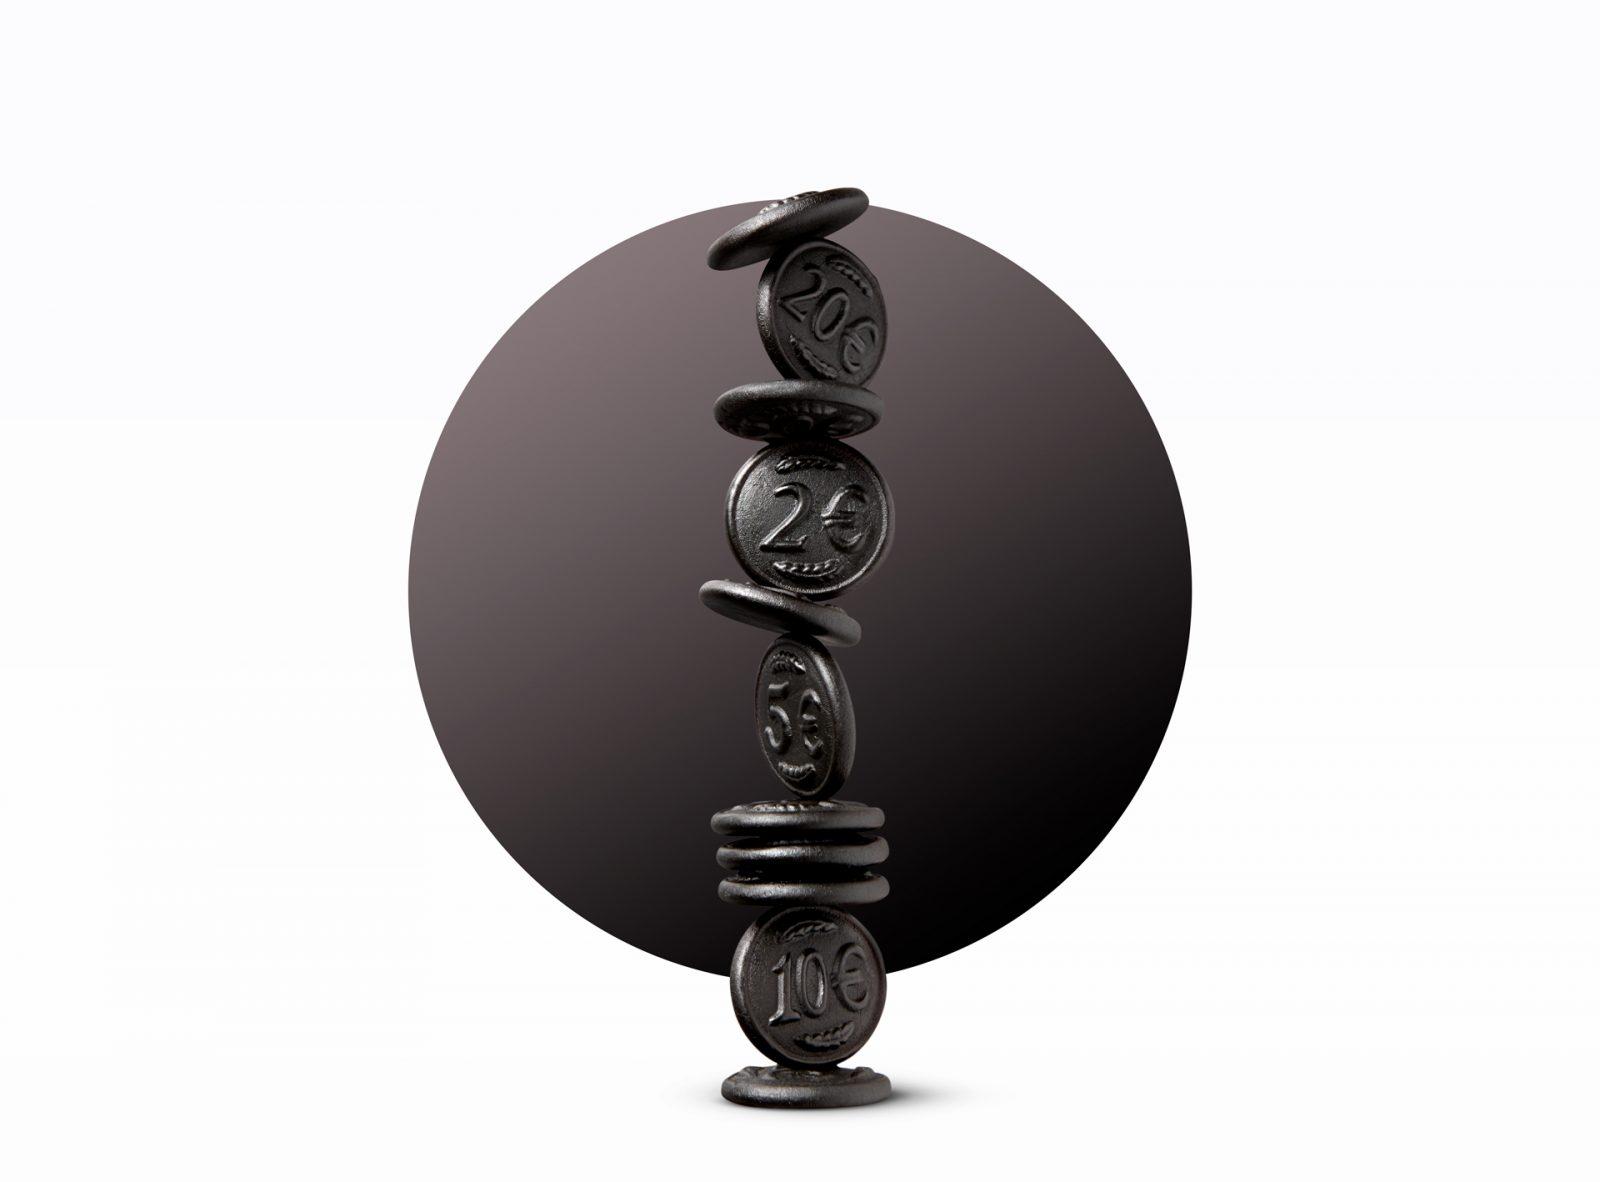 Floris Holtland - packaging photography - liquorice - coins